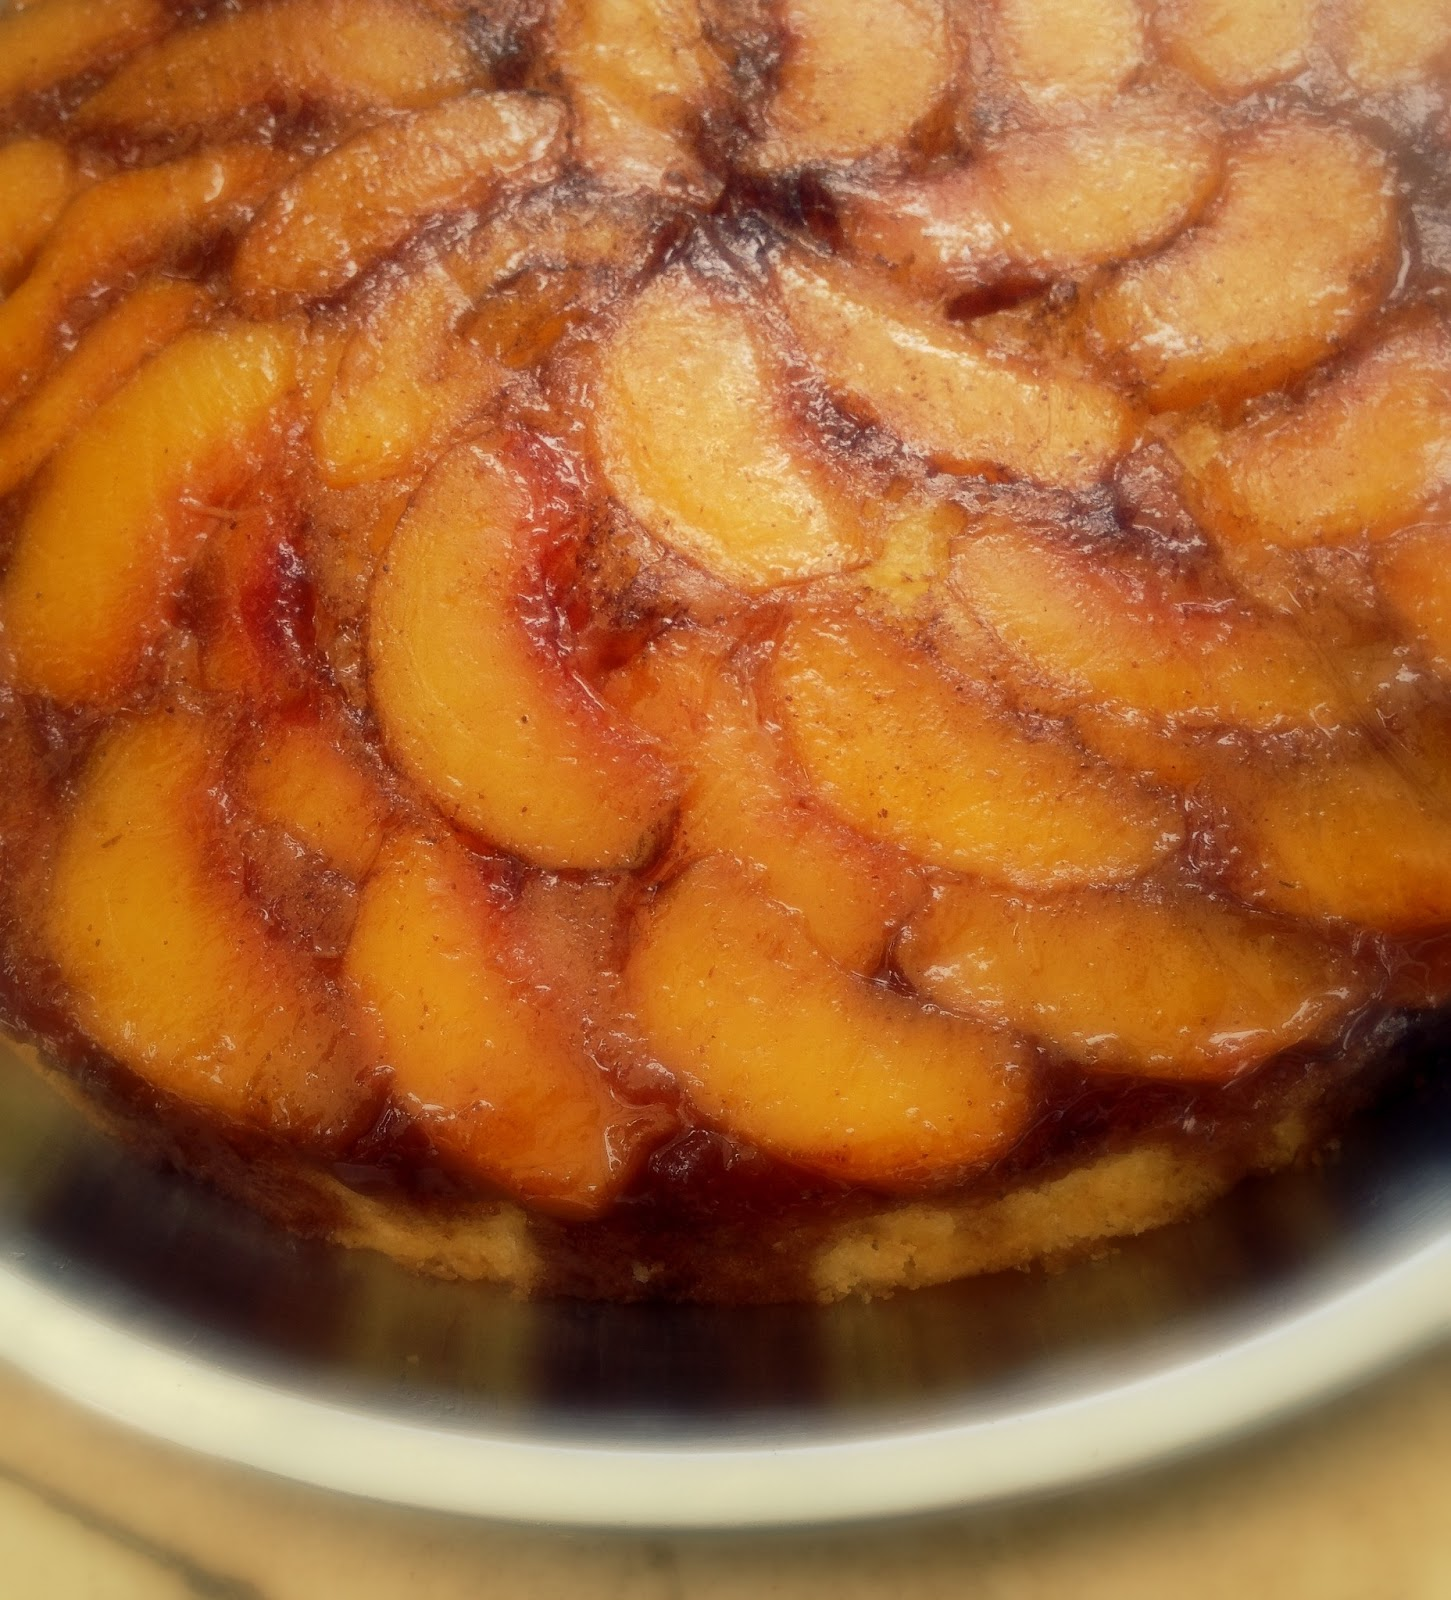 Chatkhor: Peach Upside Down Cake : My first upside down cake